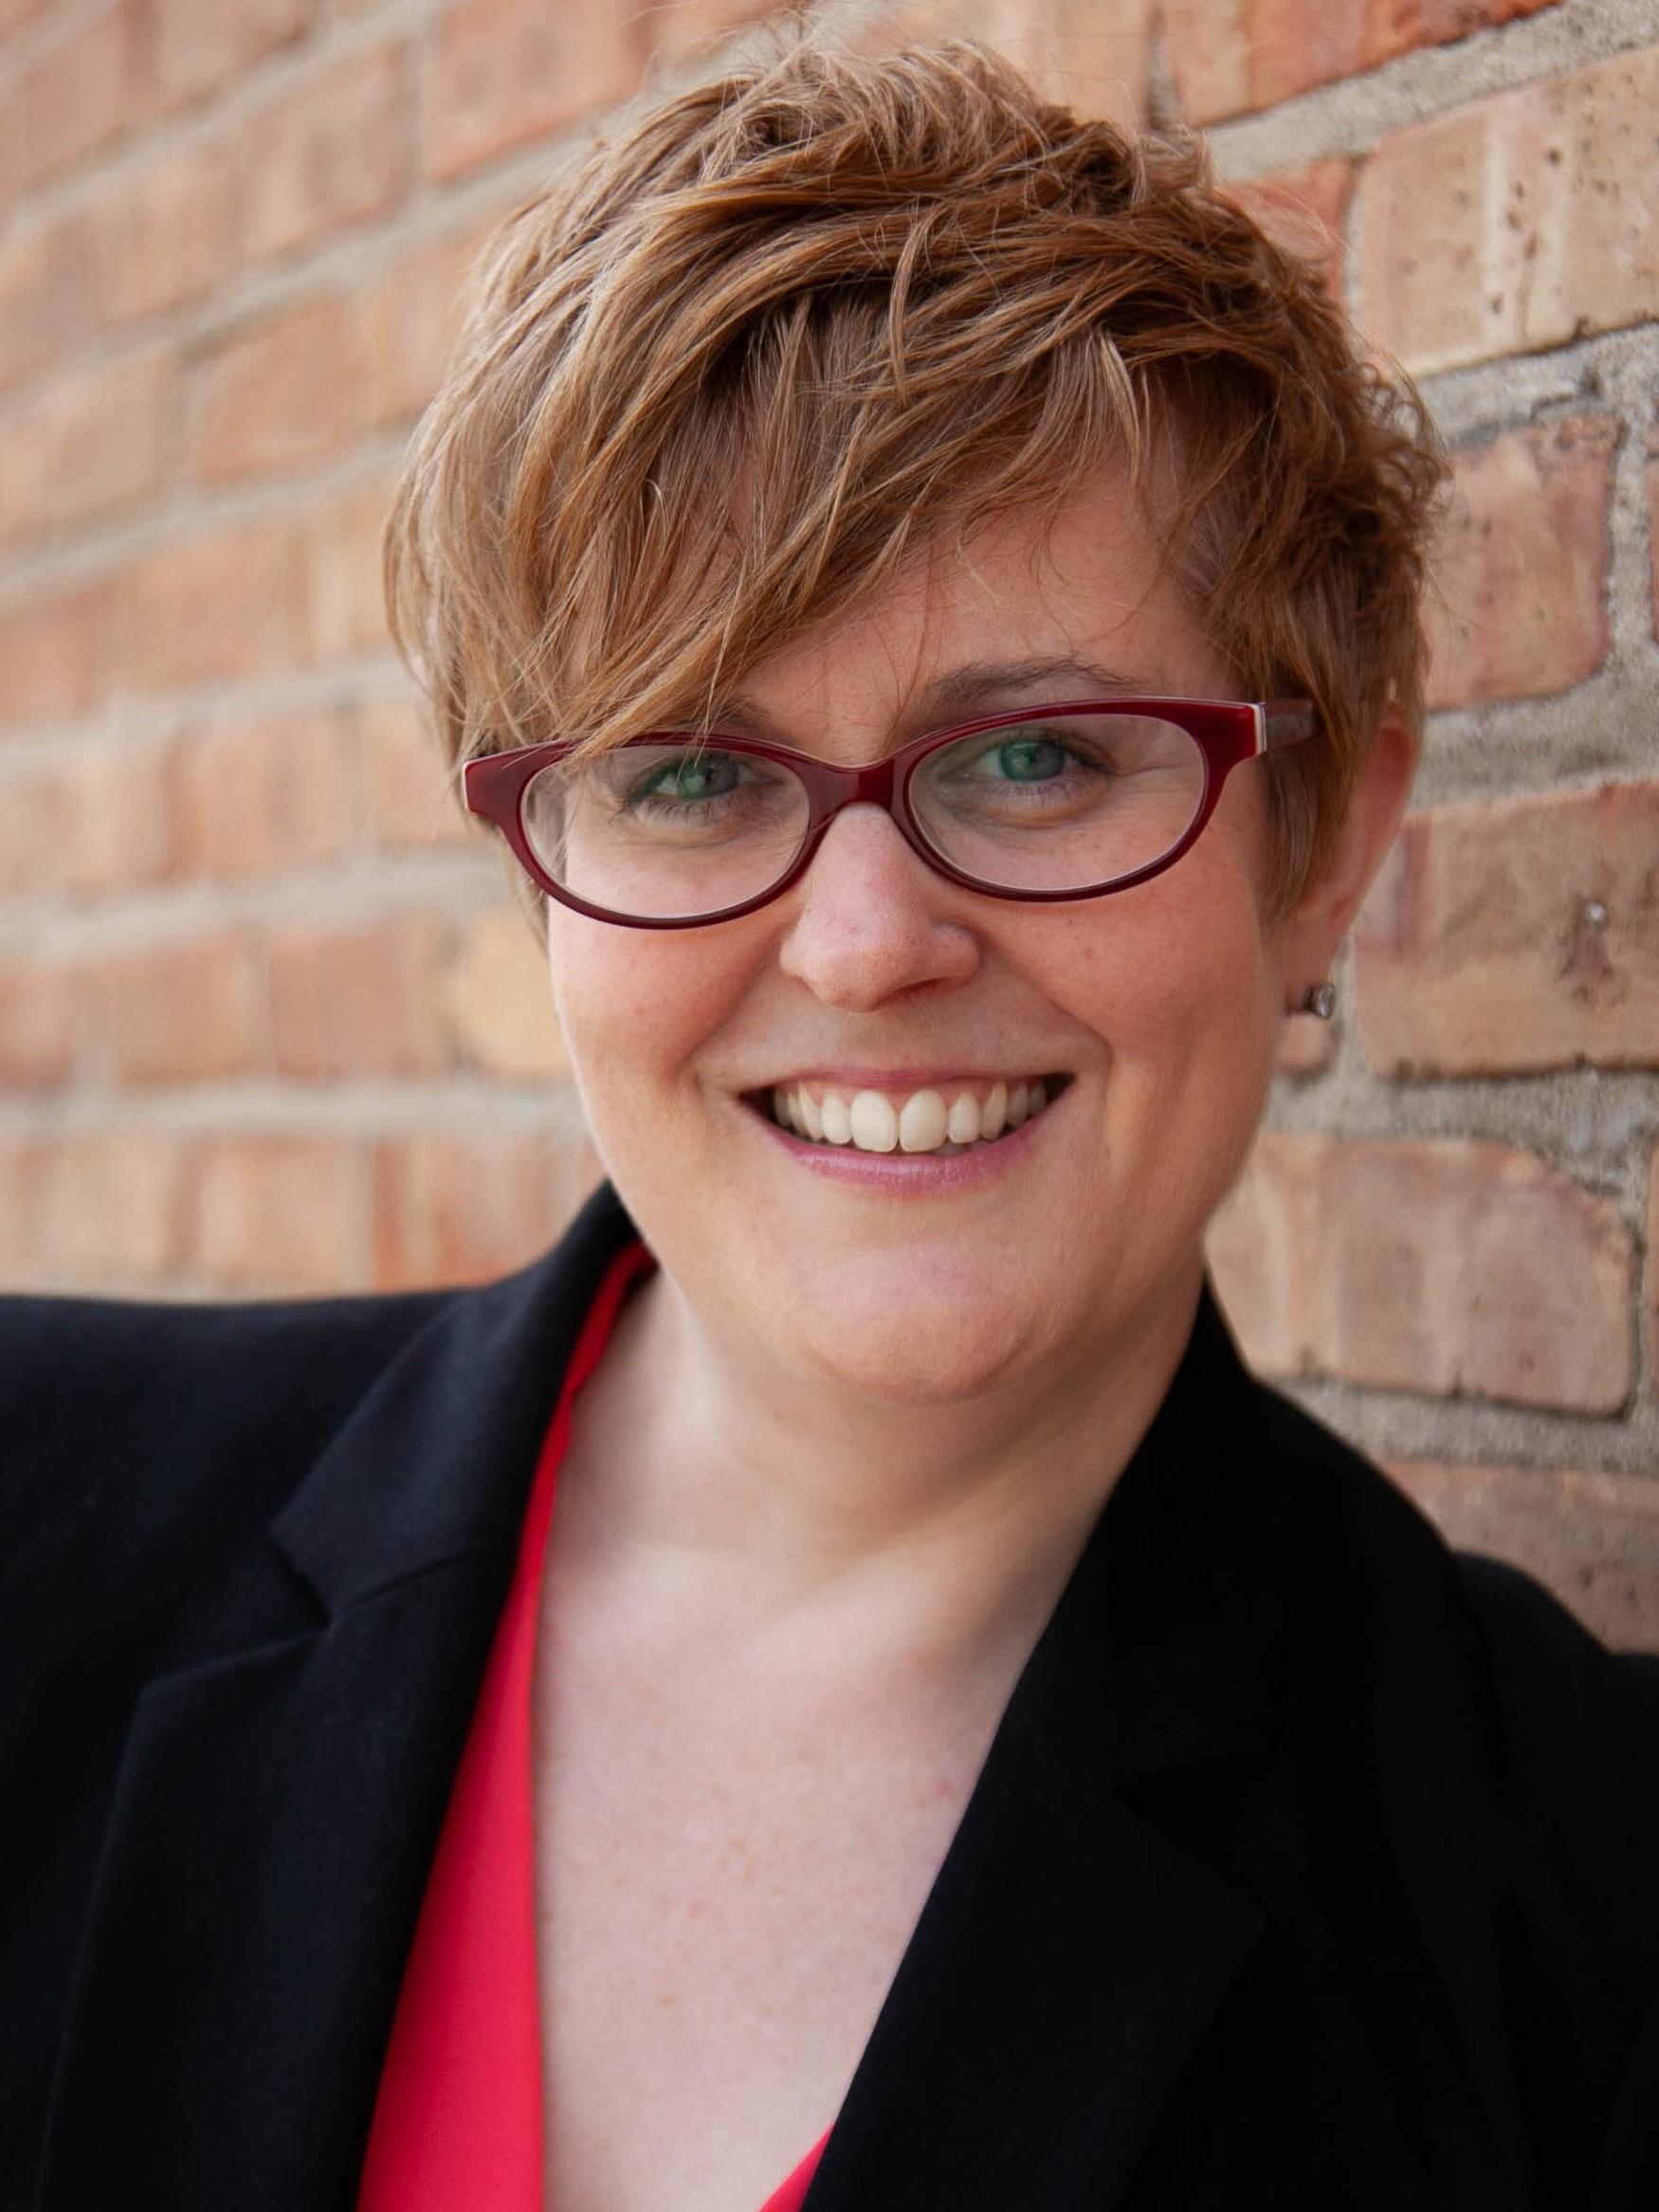 Bernadette Smith